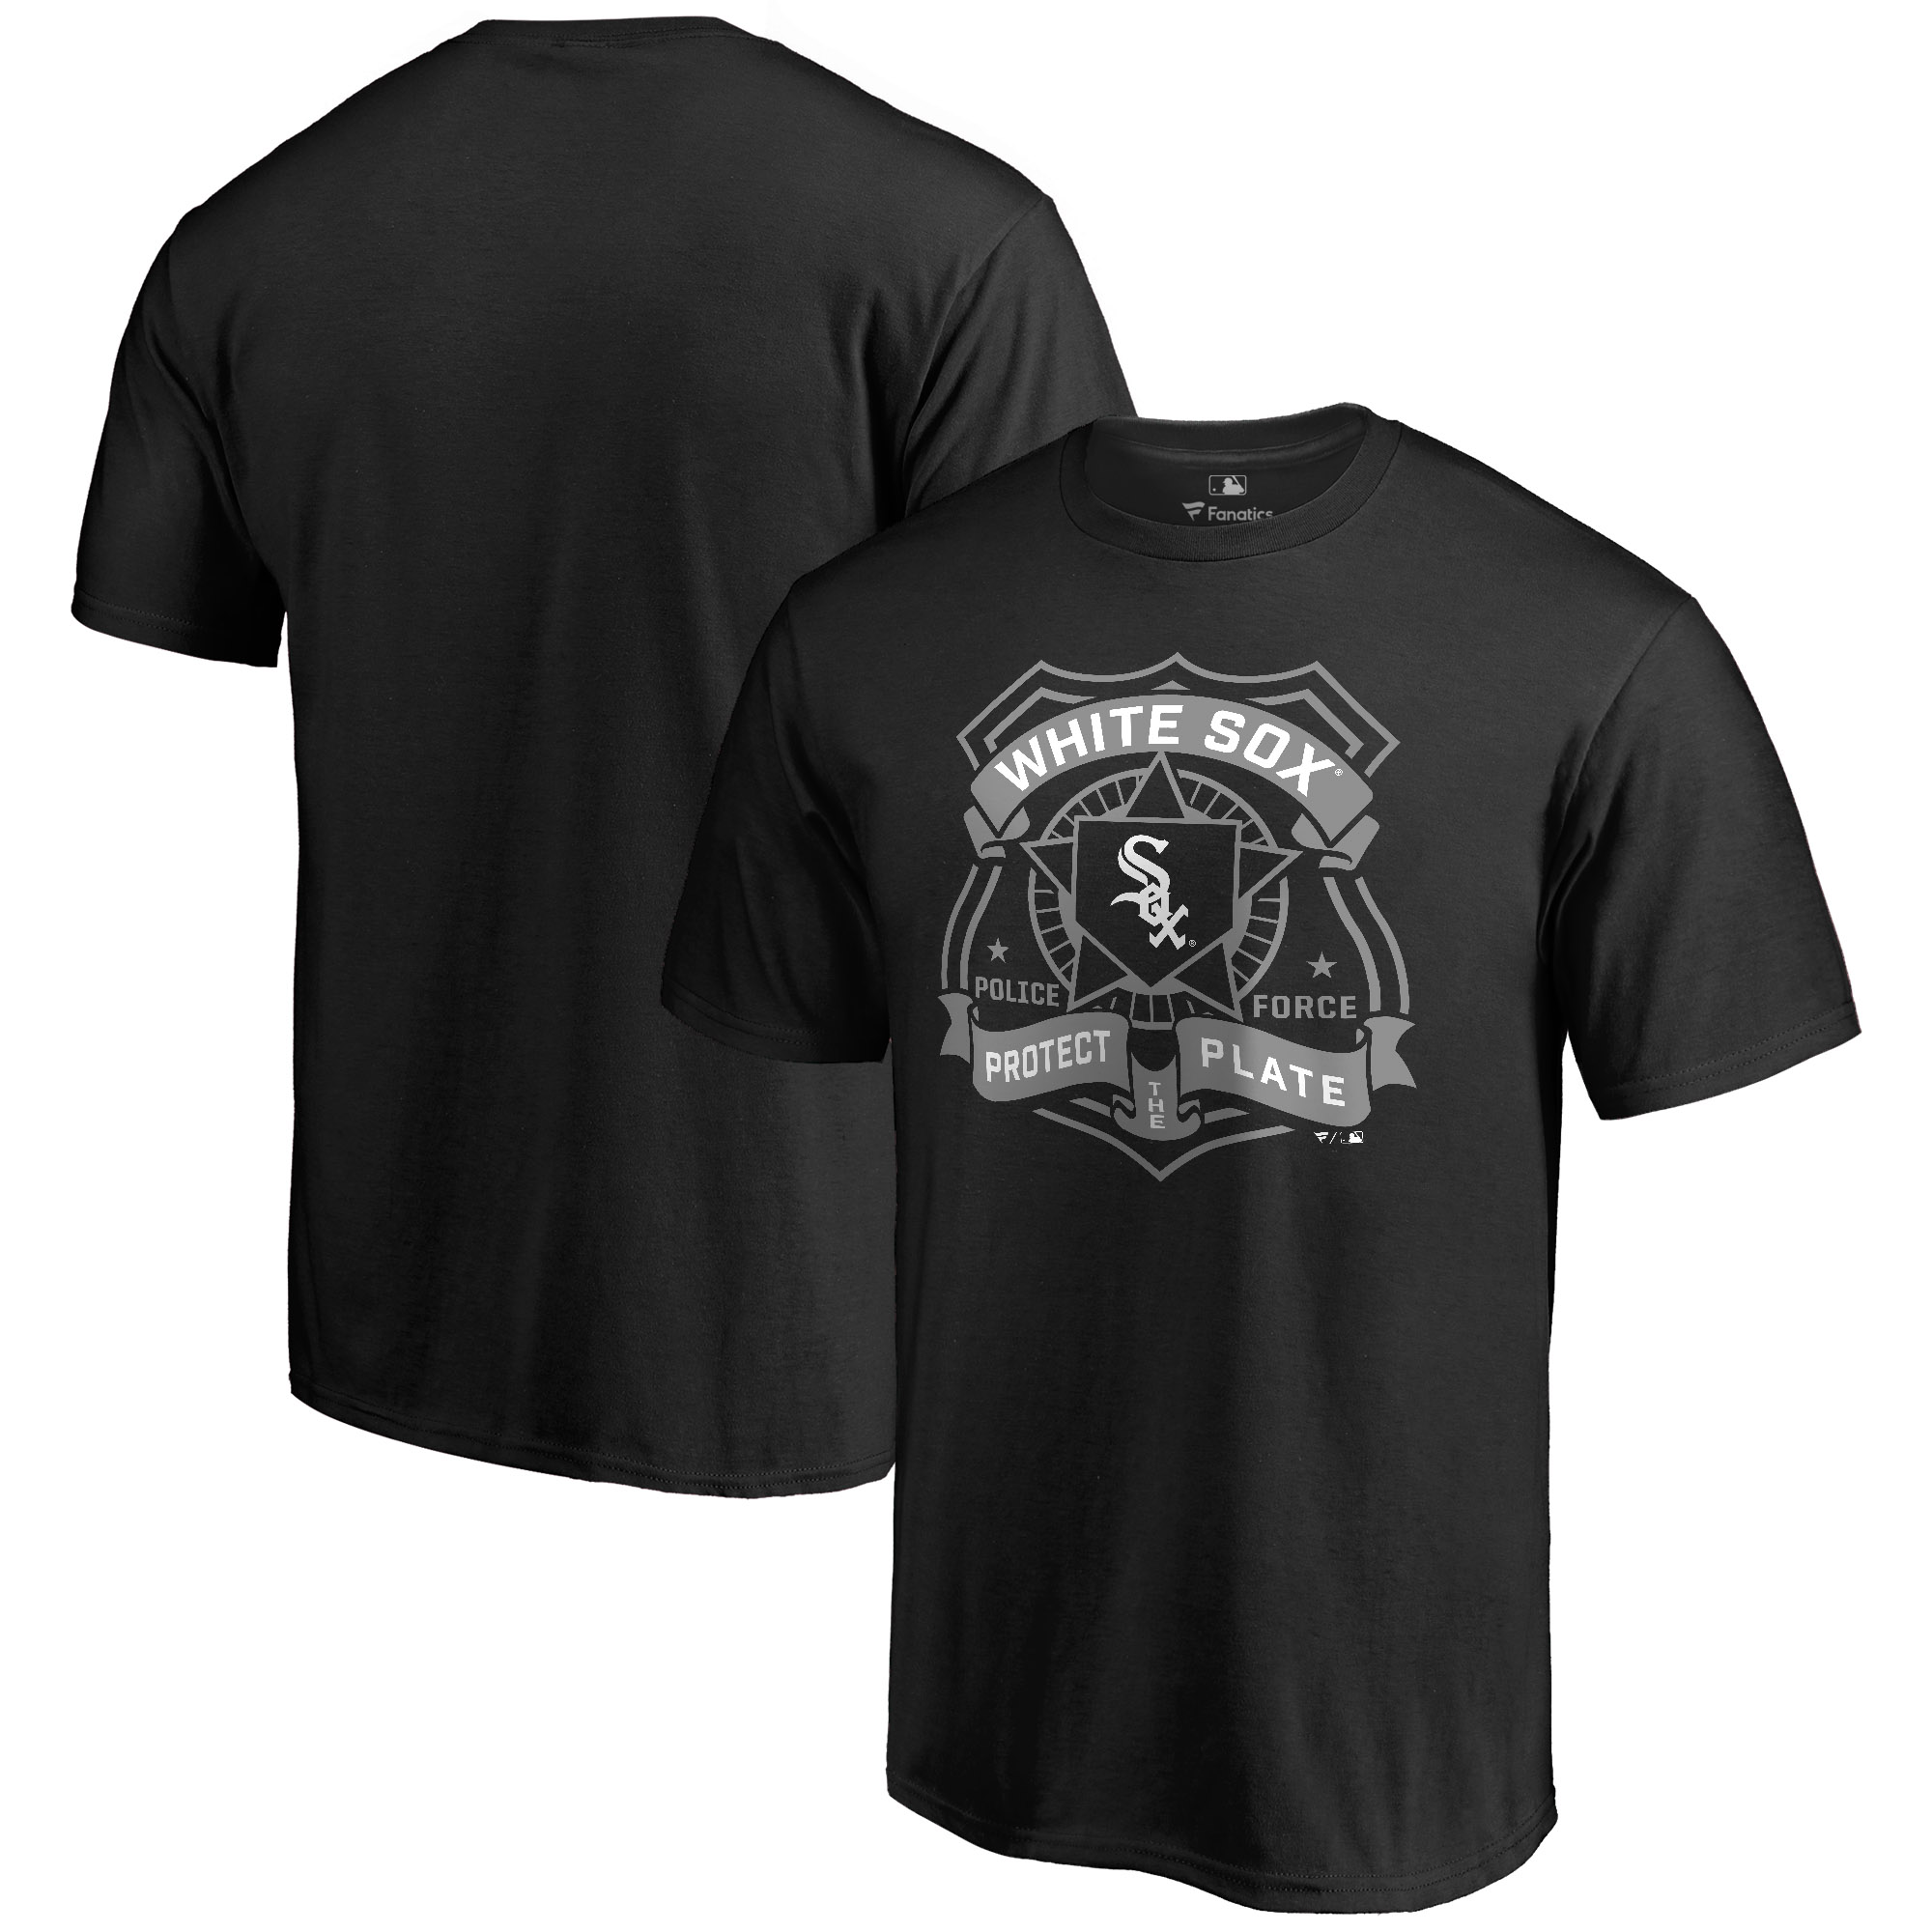 Chicago White Sox Police Badge T-Shirt - Black